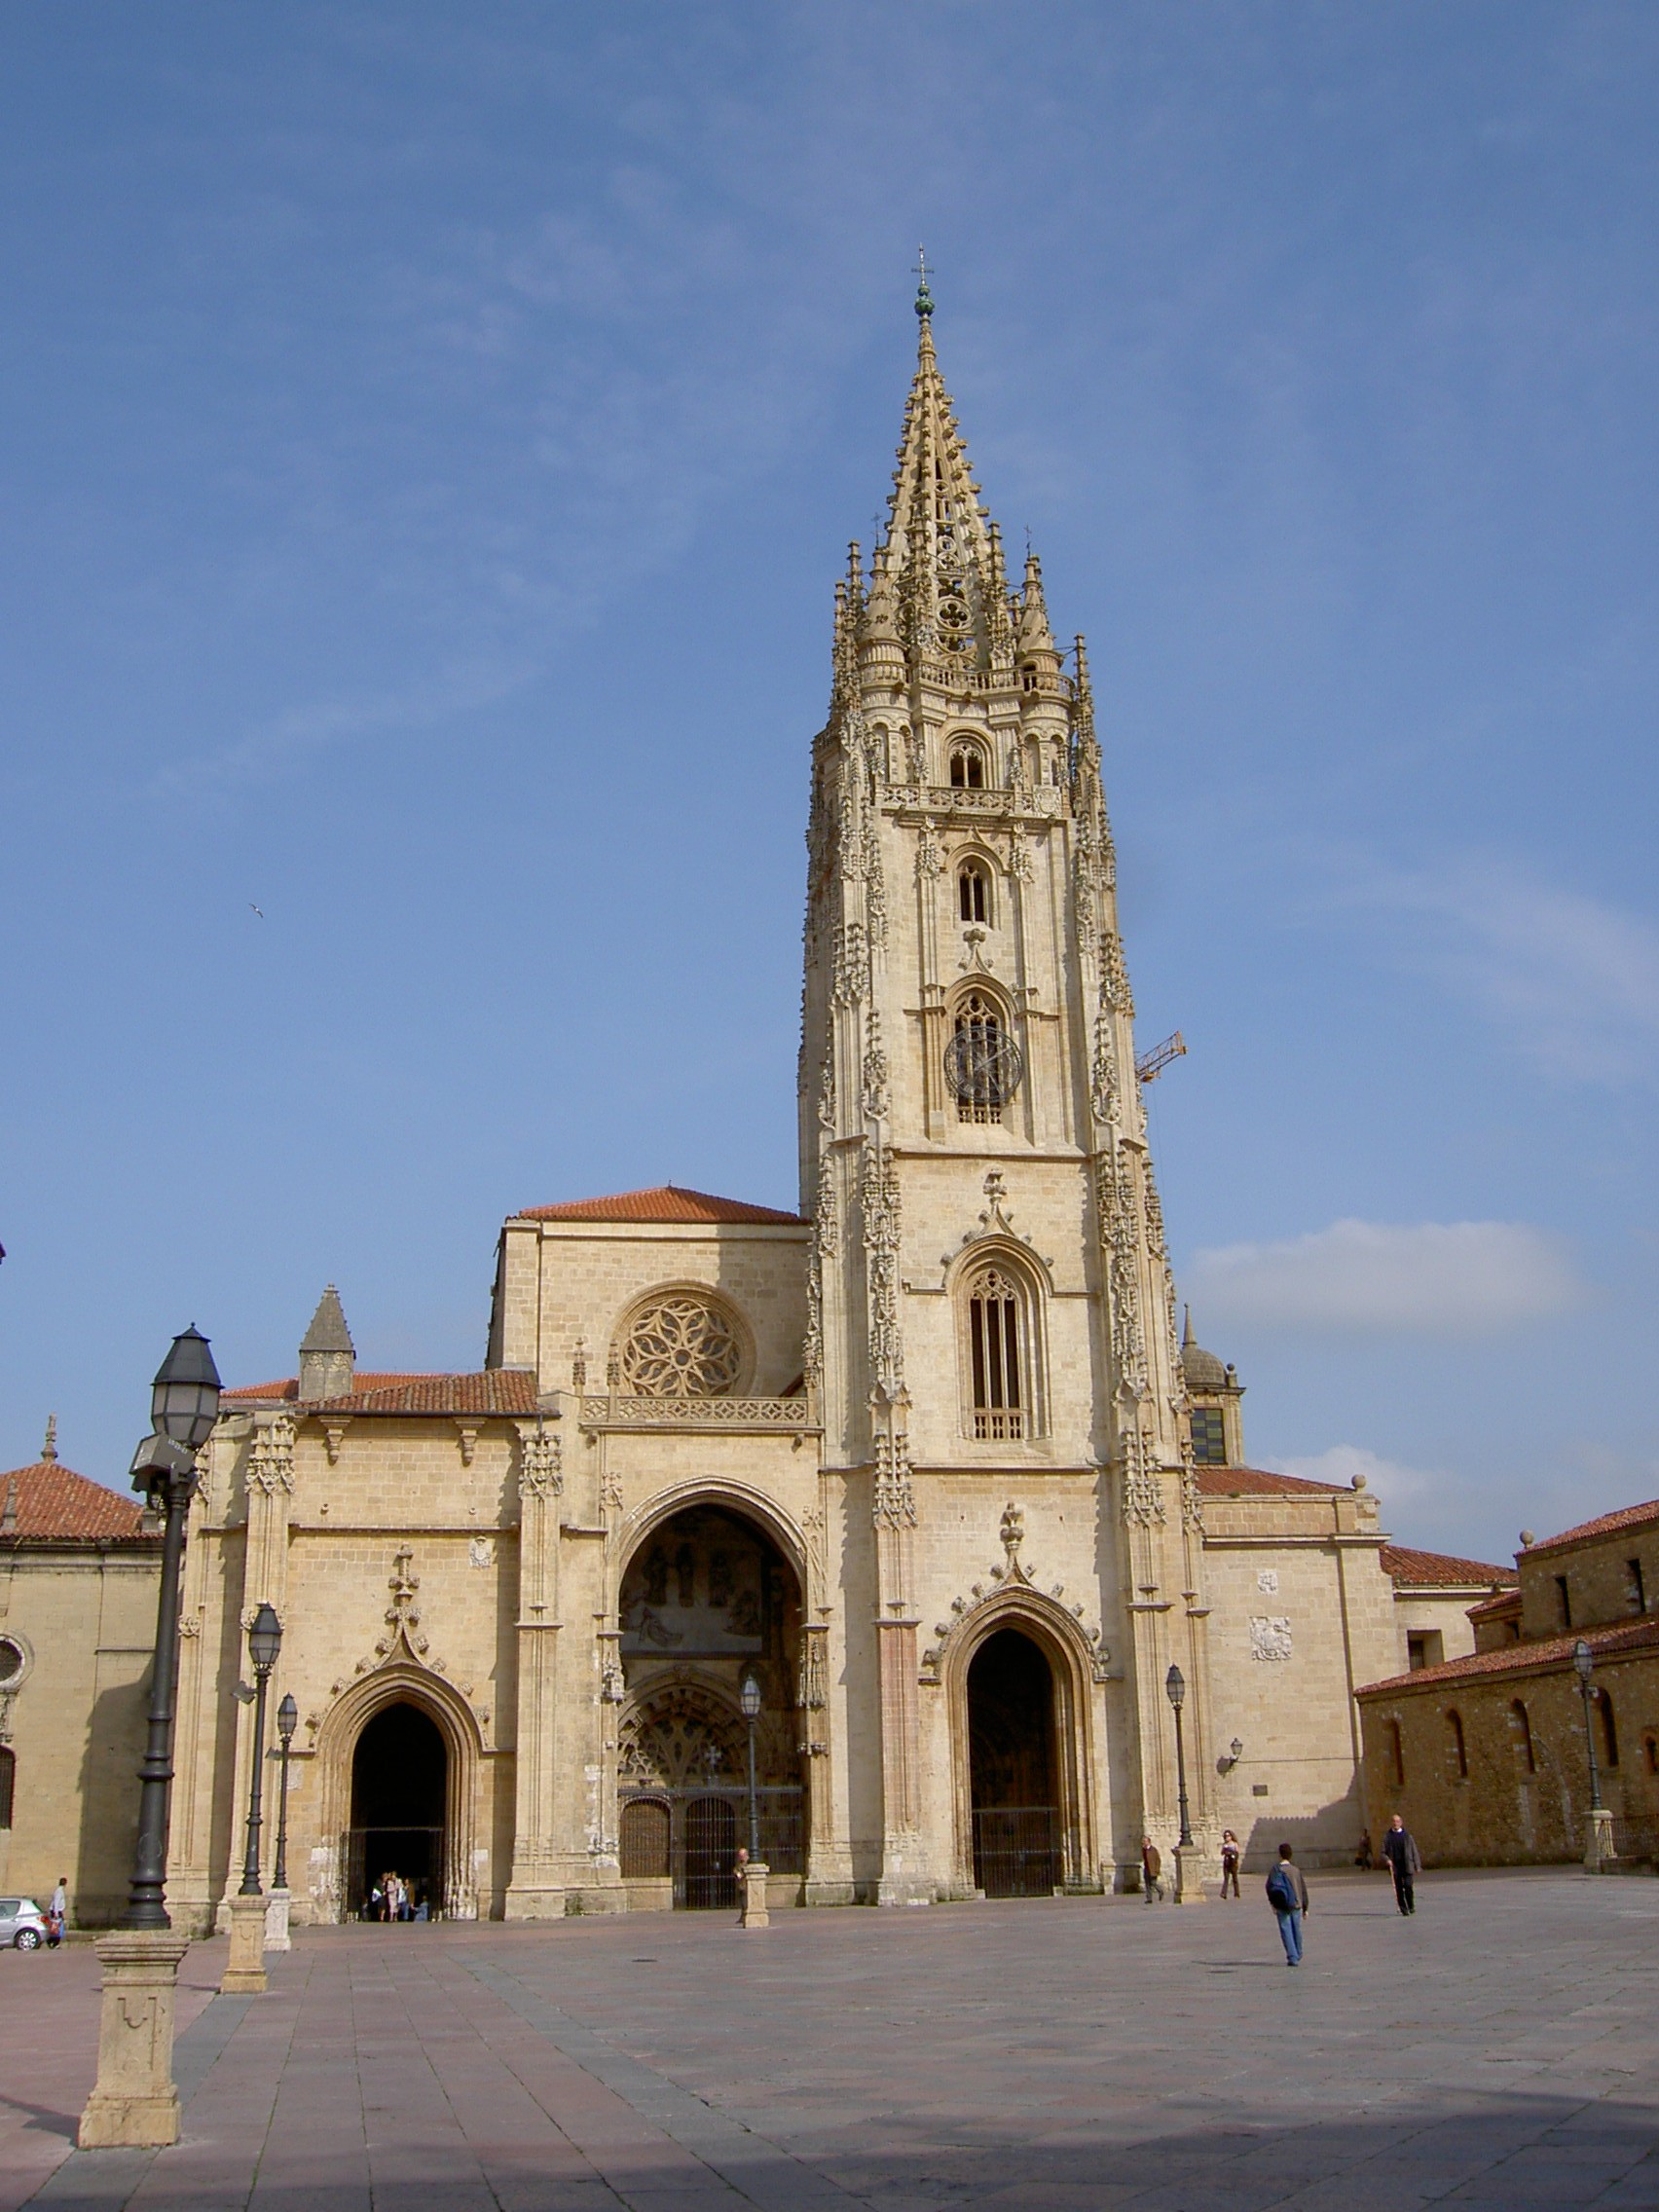 Depiction of Catedral de San Salvador de Oviedo